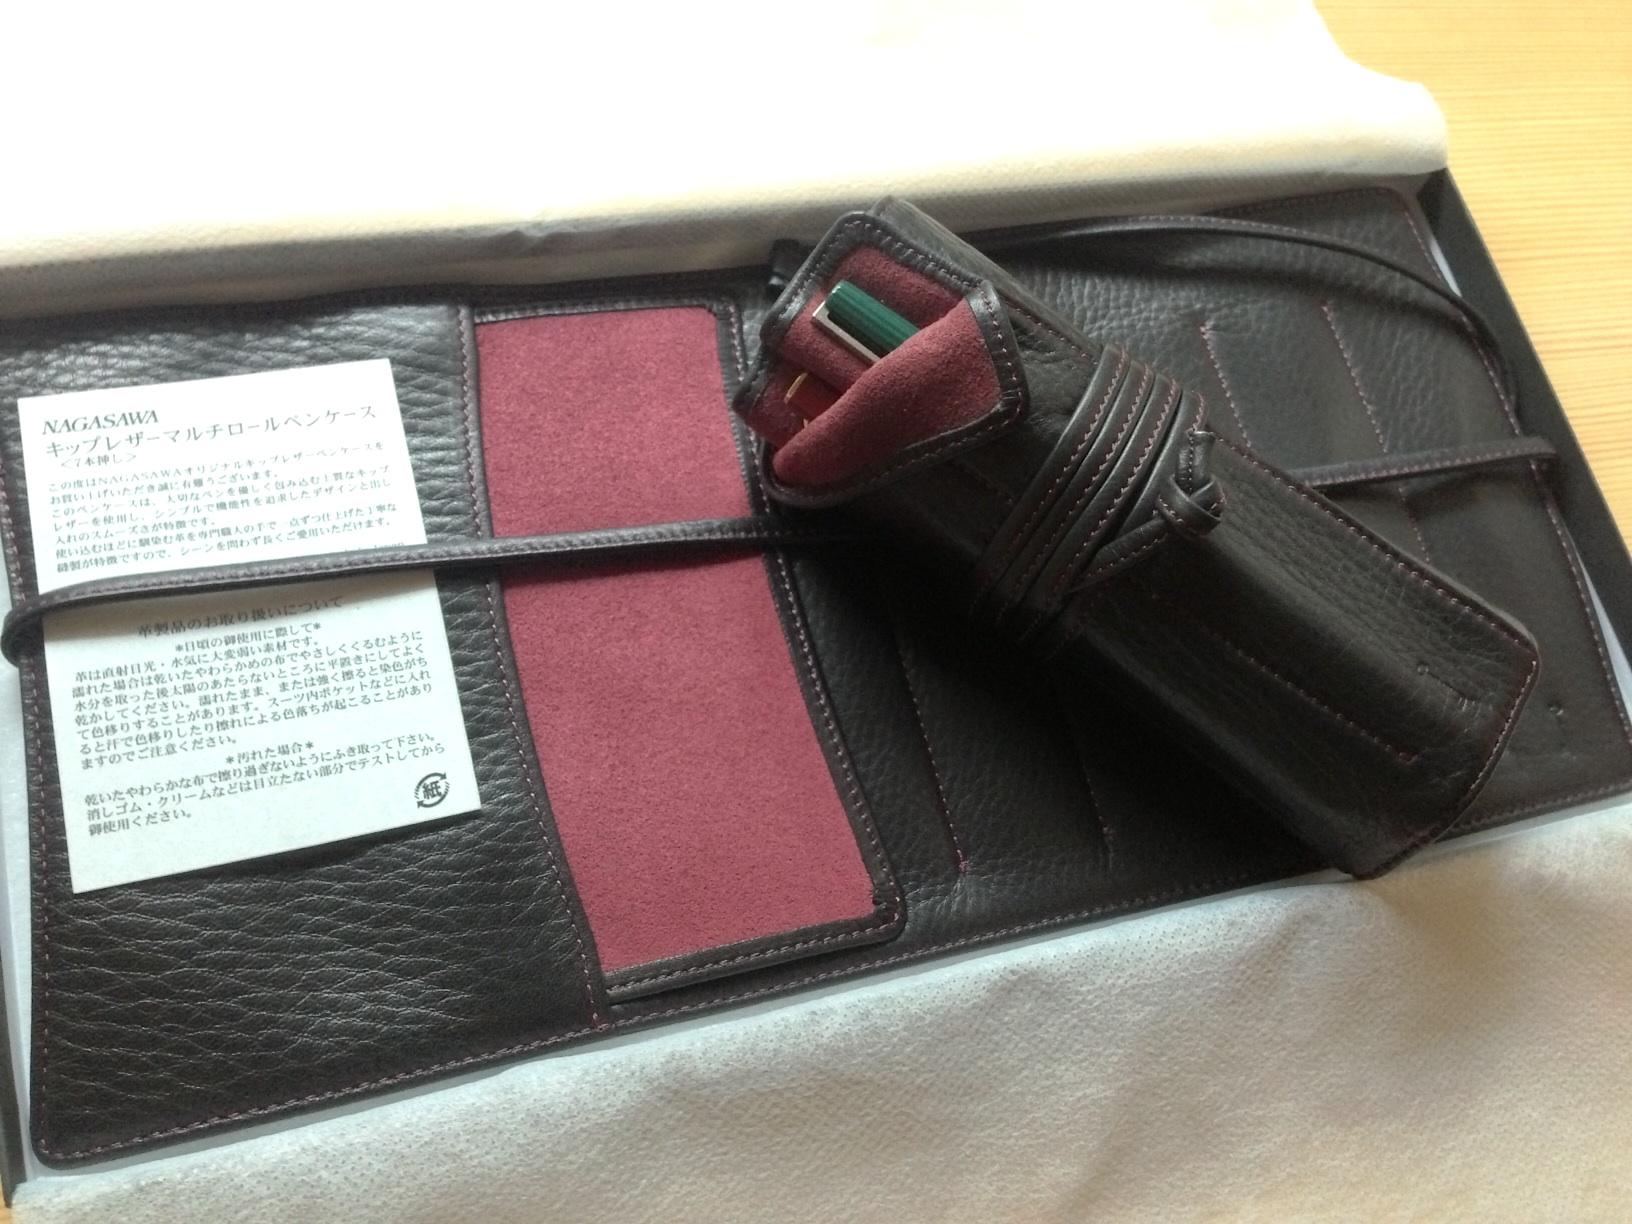 NAGASAWA PenStyle キップ 7本差し マルチロールペンケース